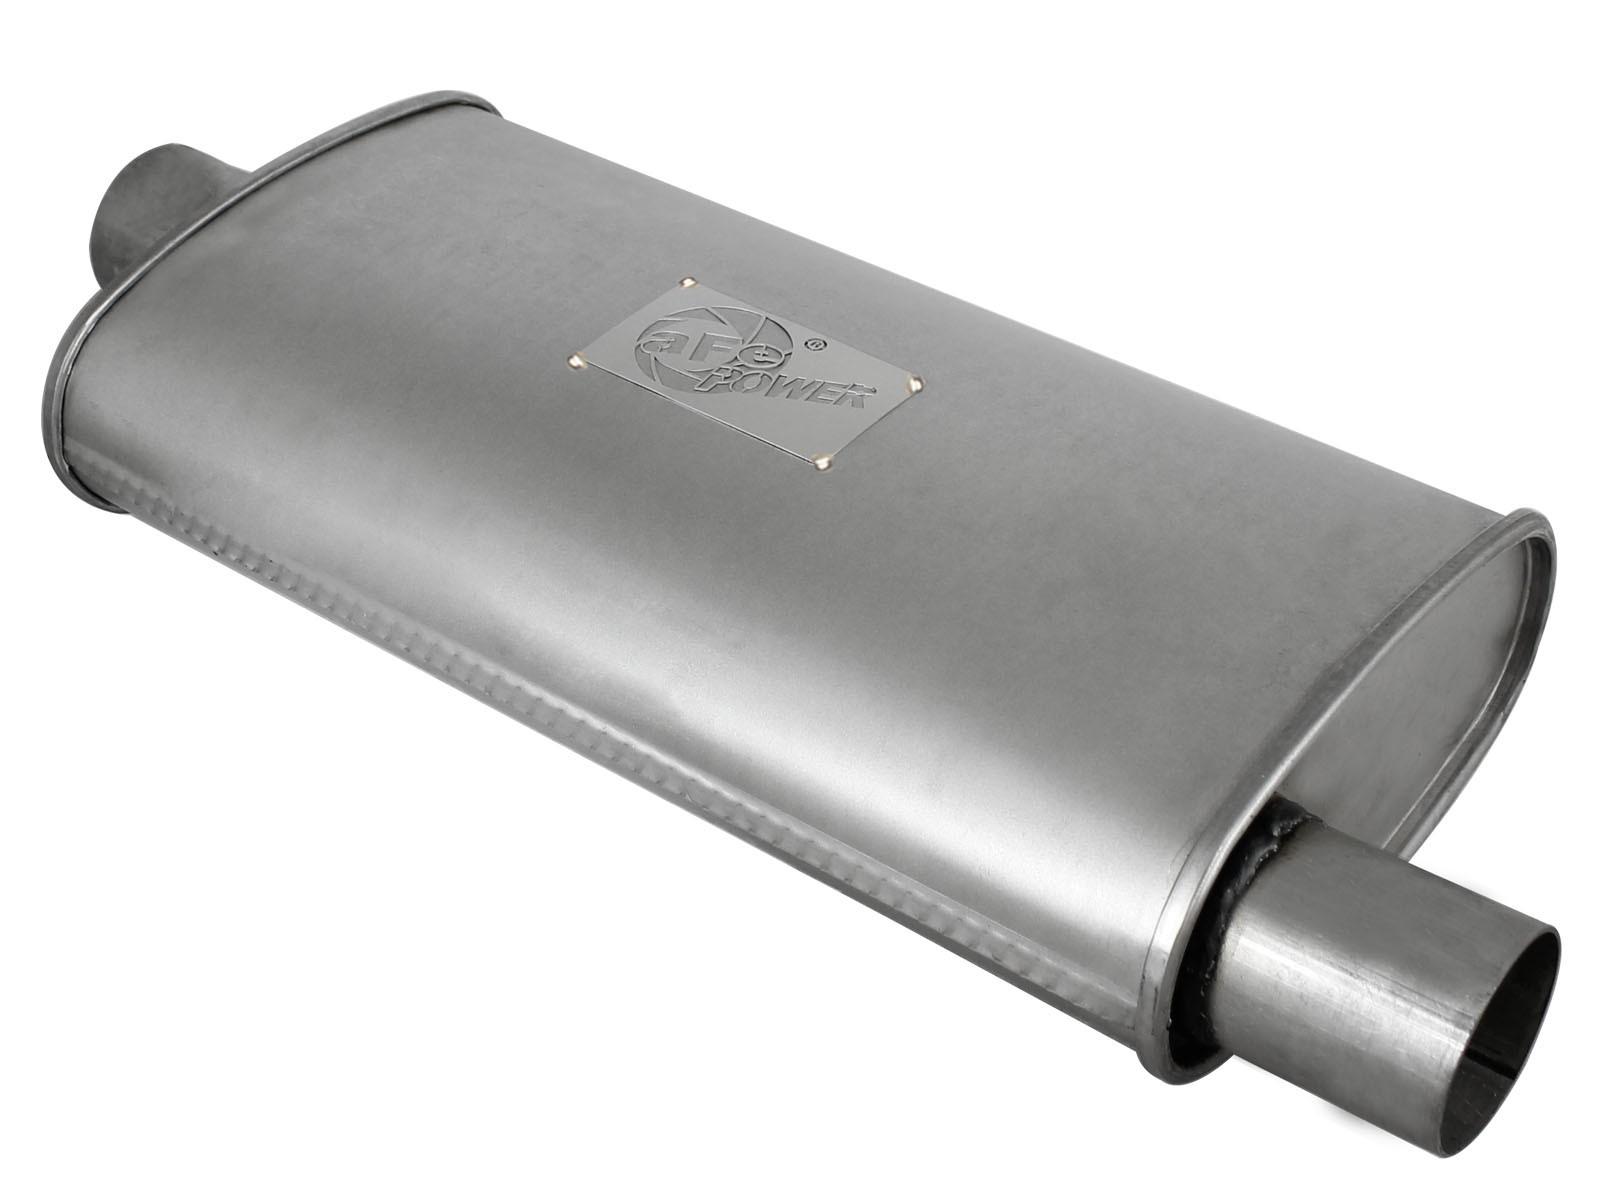 "aFe POWER 49M00002 Scorpion 2-1/2"" Aluminized Steel Muffler"